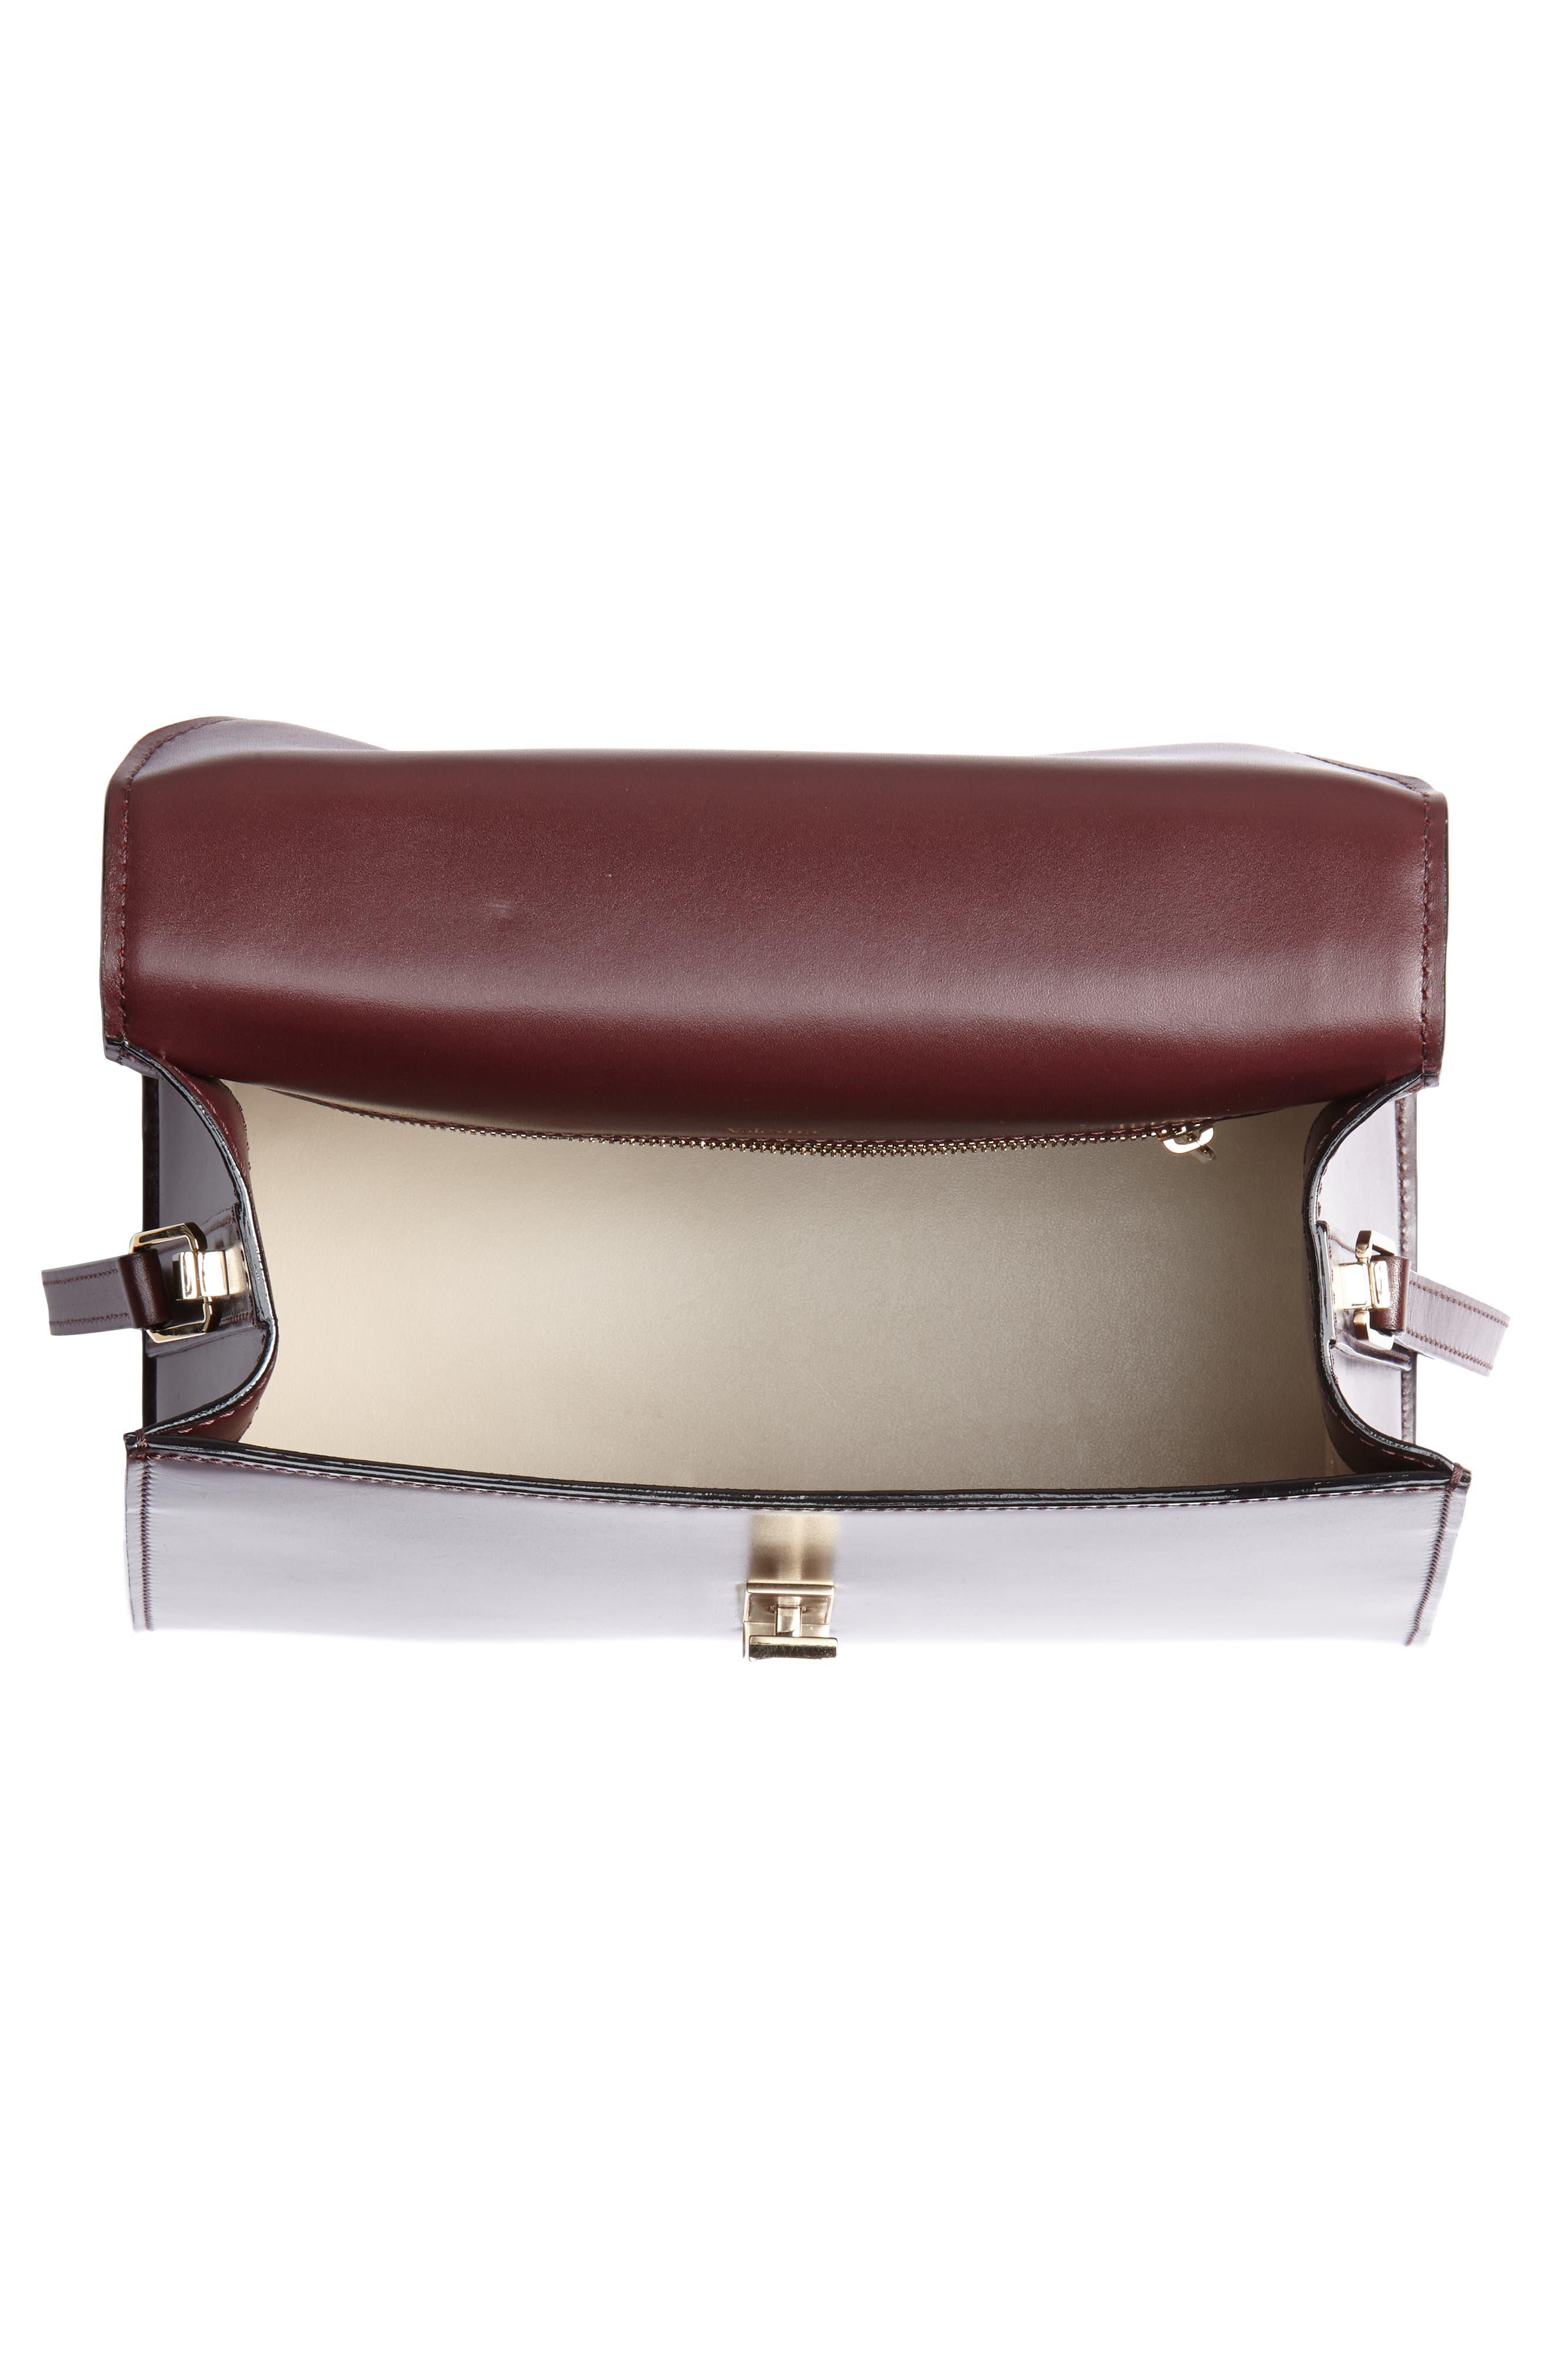 Iside Medium Colorblock Leather Top Handle Bag,                             Alternate thumbnail 4, color,                             FRAGOLA/ GRANATA